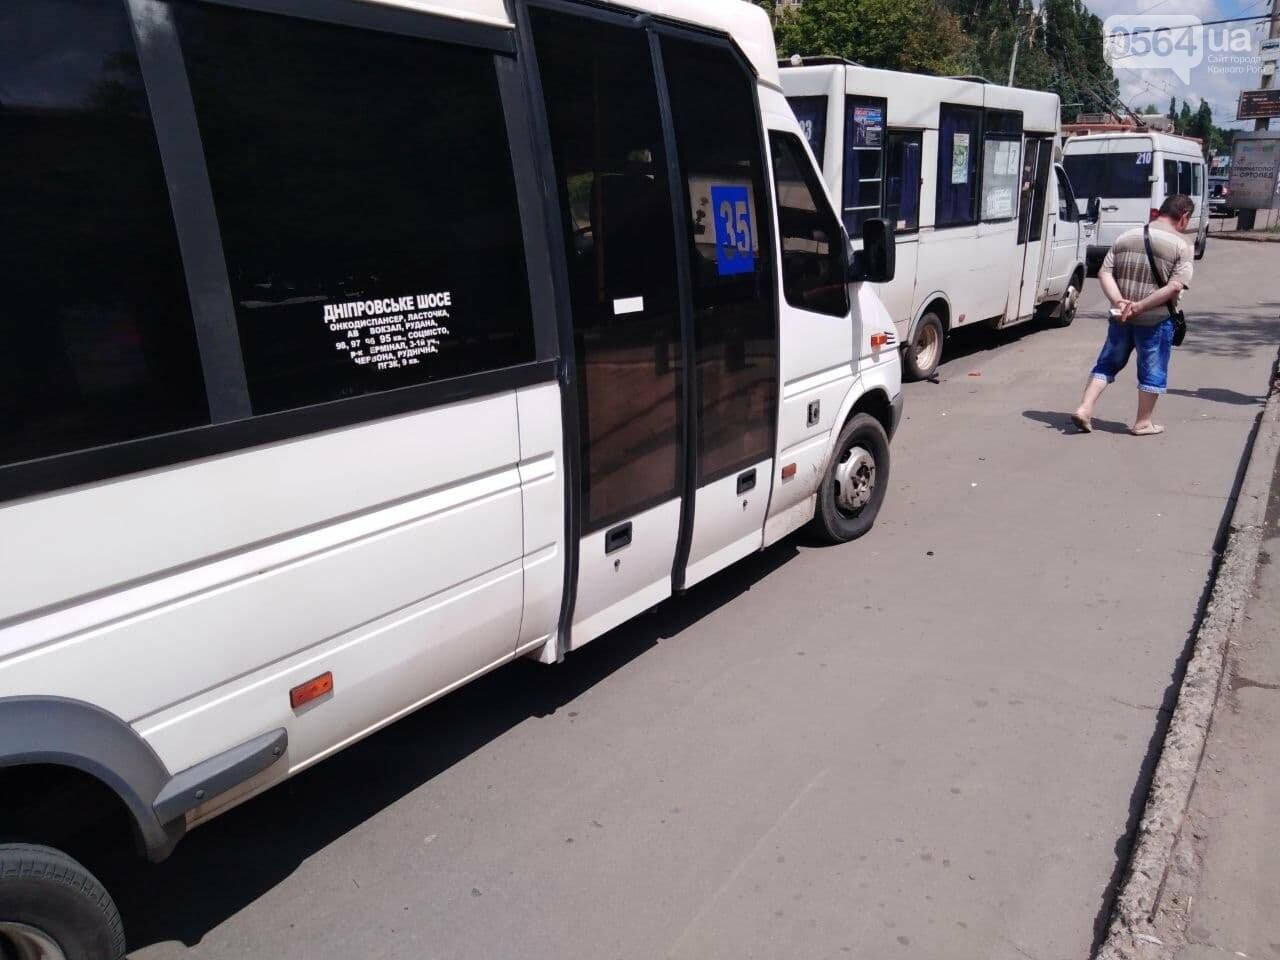 В Кривом Роге столкнулись две маршрутки, - ФОТО, фото-5